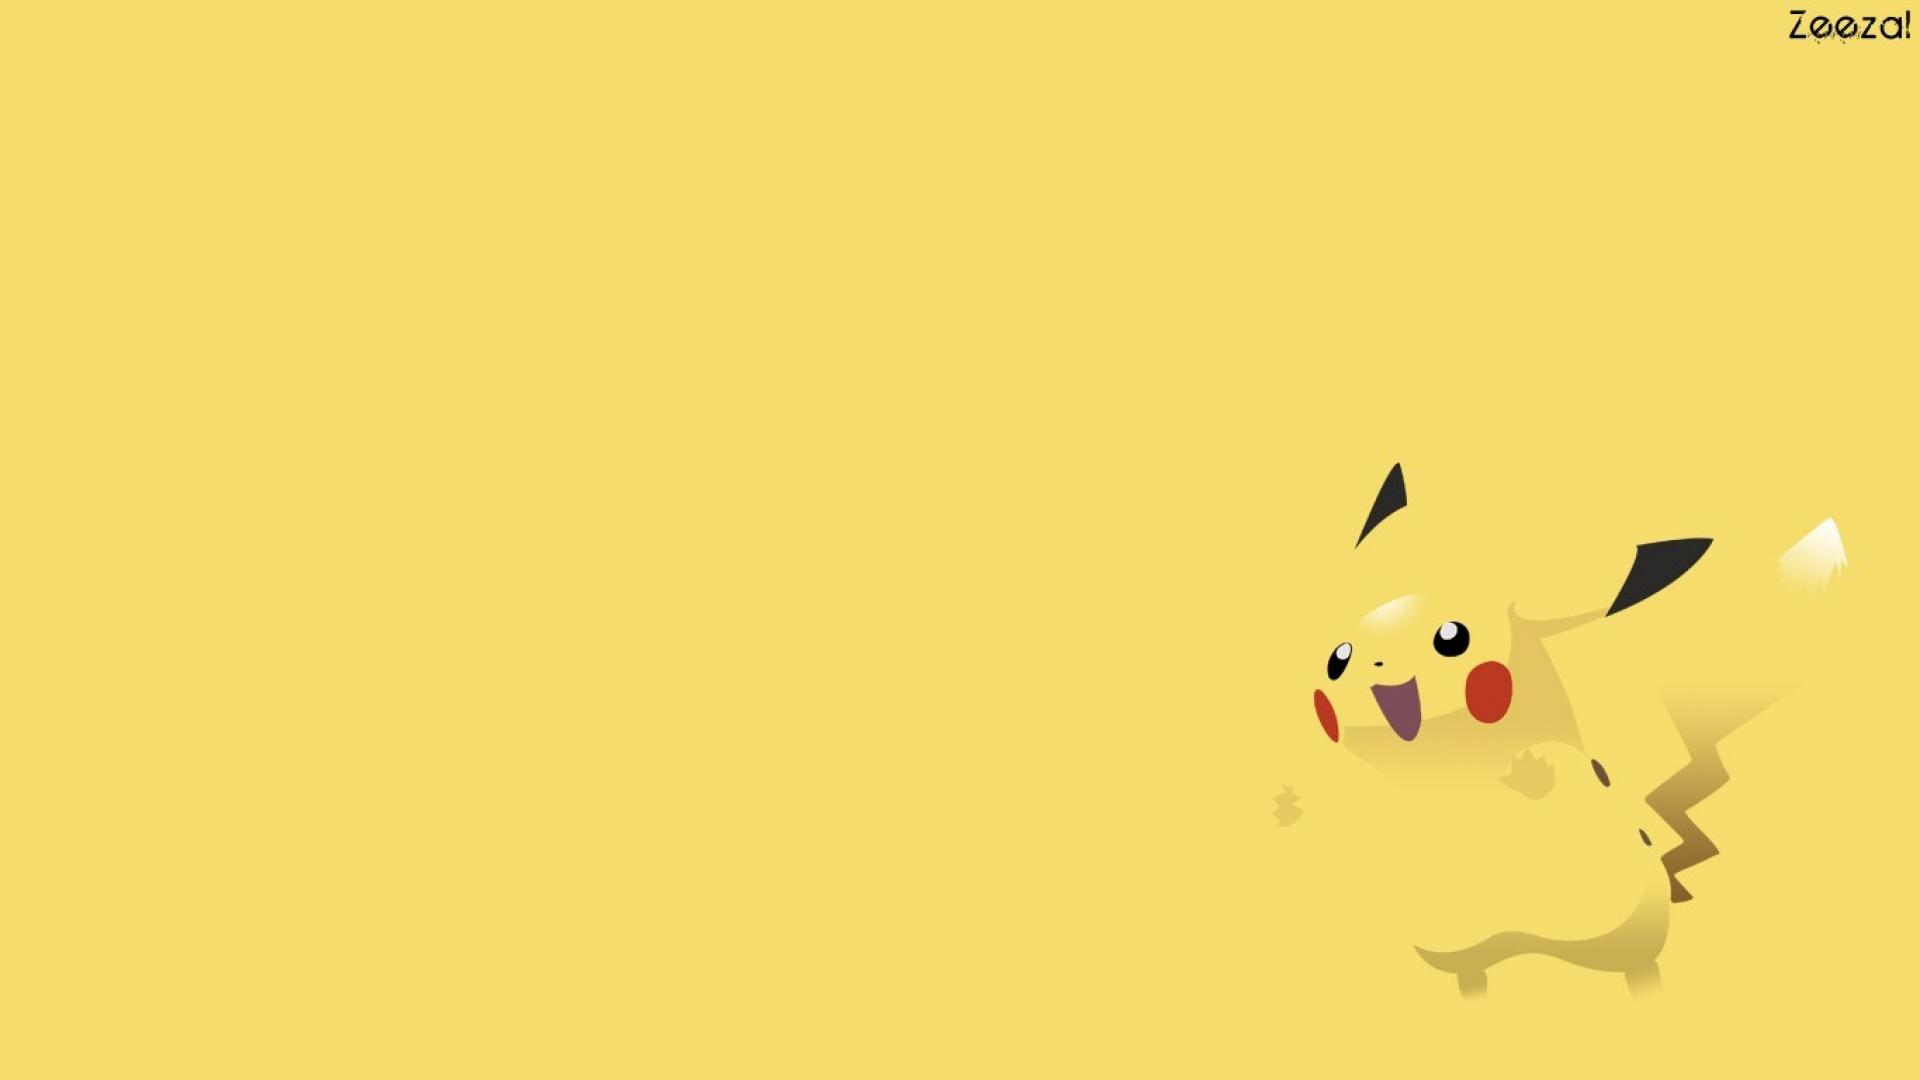 Pokemon minimalistic pikachu wallpaper 9129 1920x1080